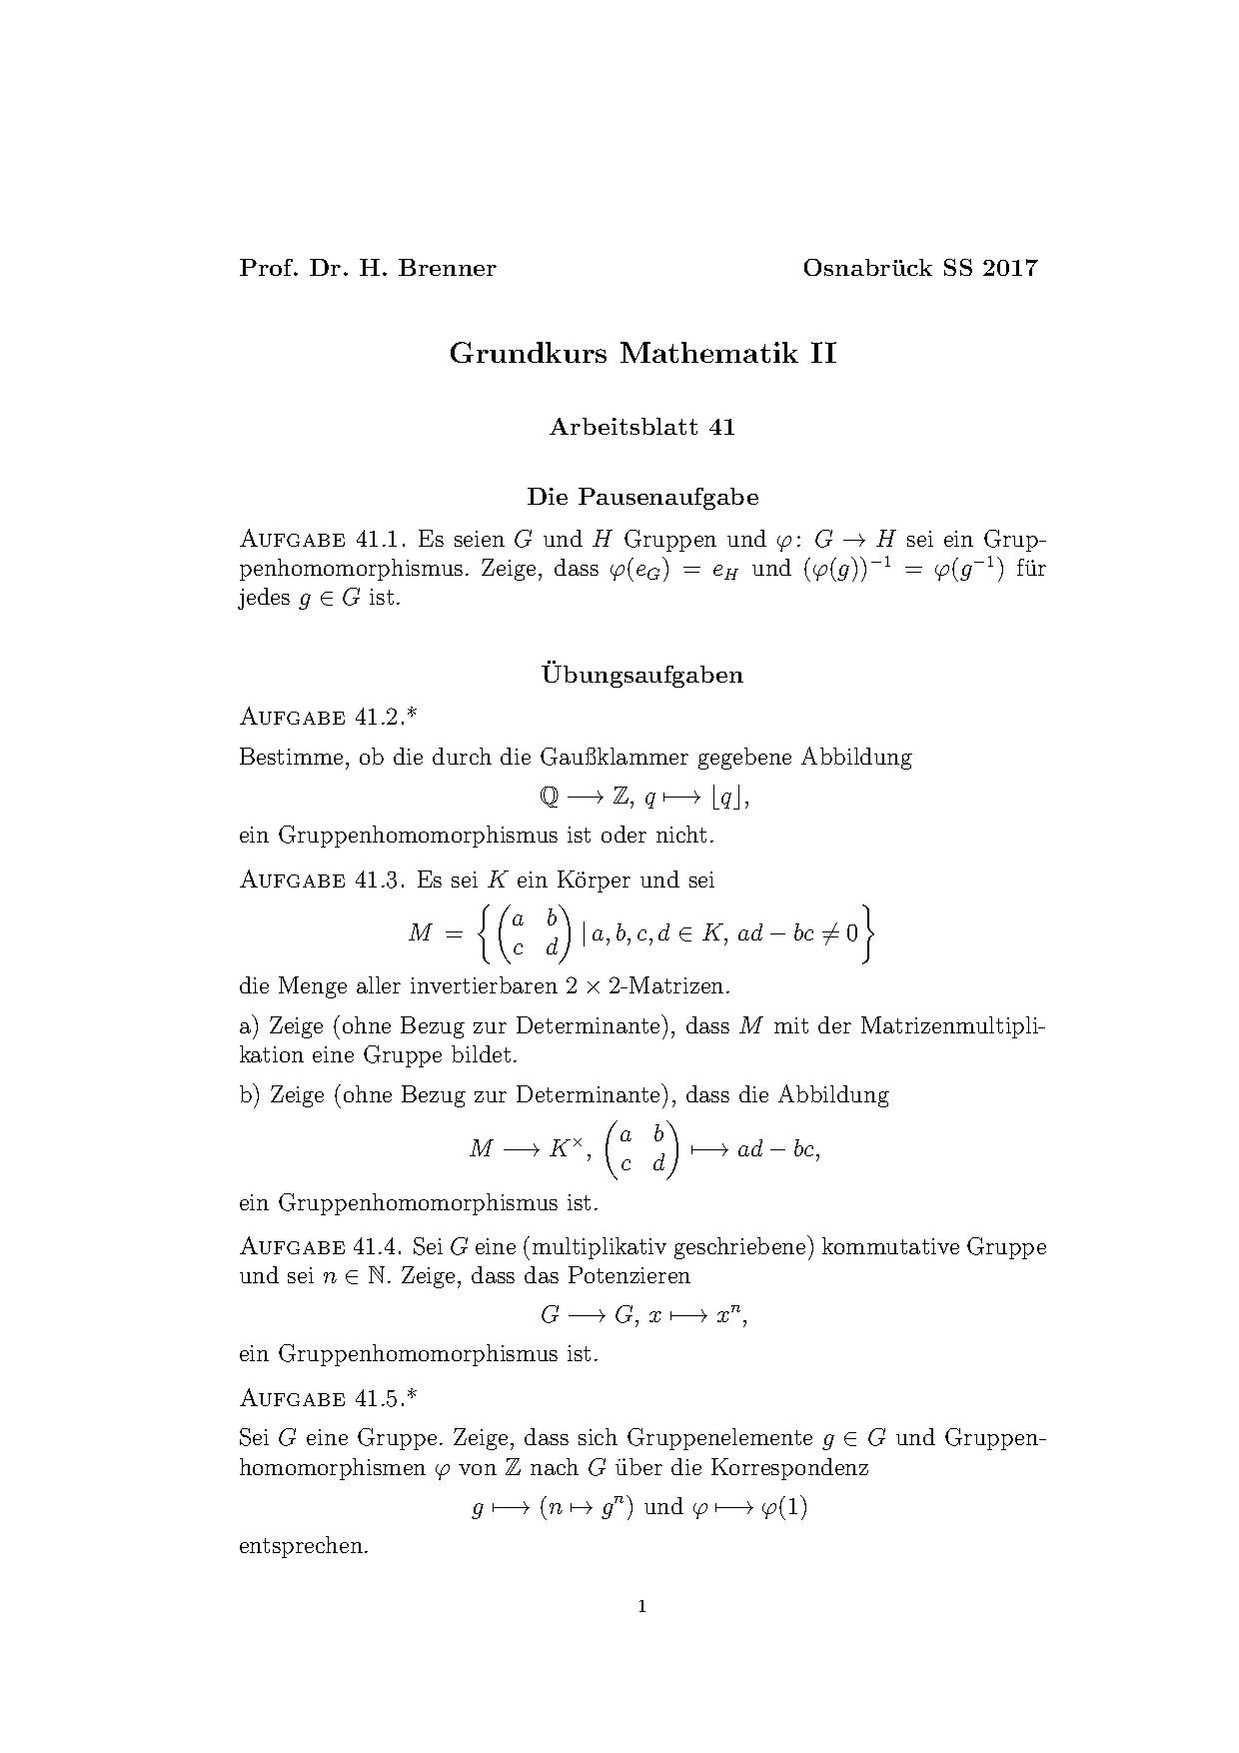 File:Grundkurs Mathematik (Osnabrück 2016-2017)Teil IIArbeitsblatt41 ...